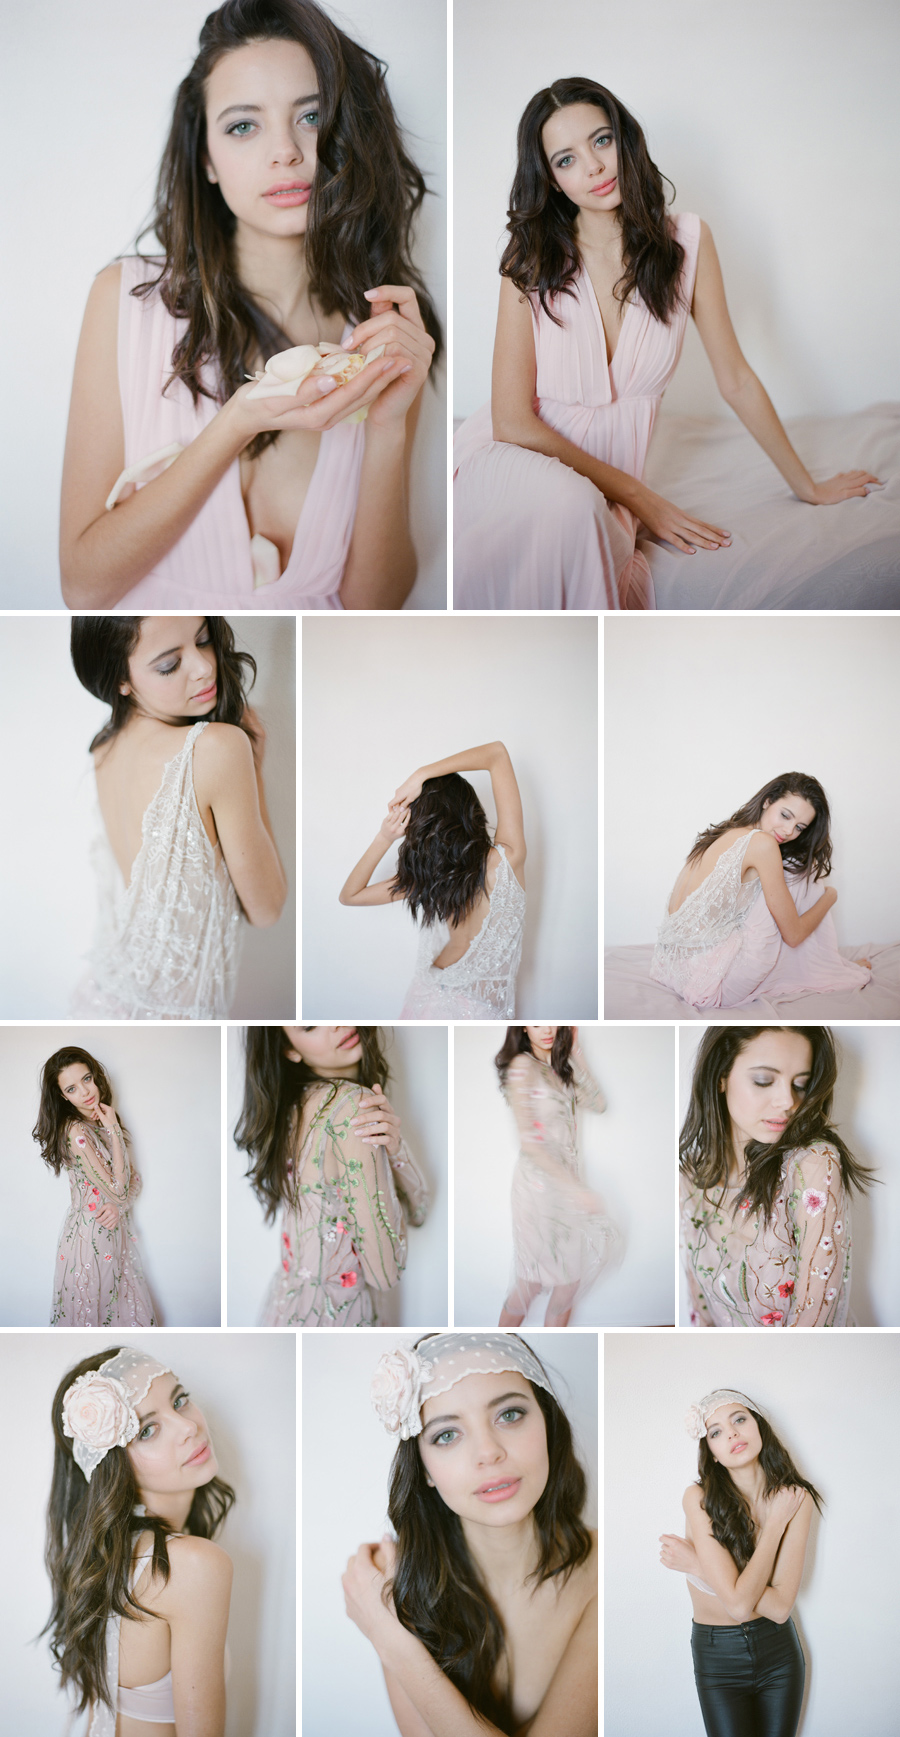 monaco fashion photographer portraiture